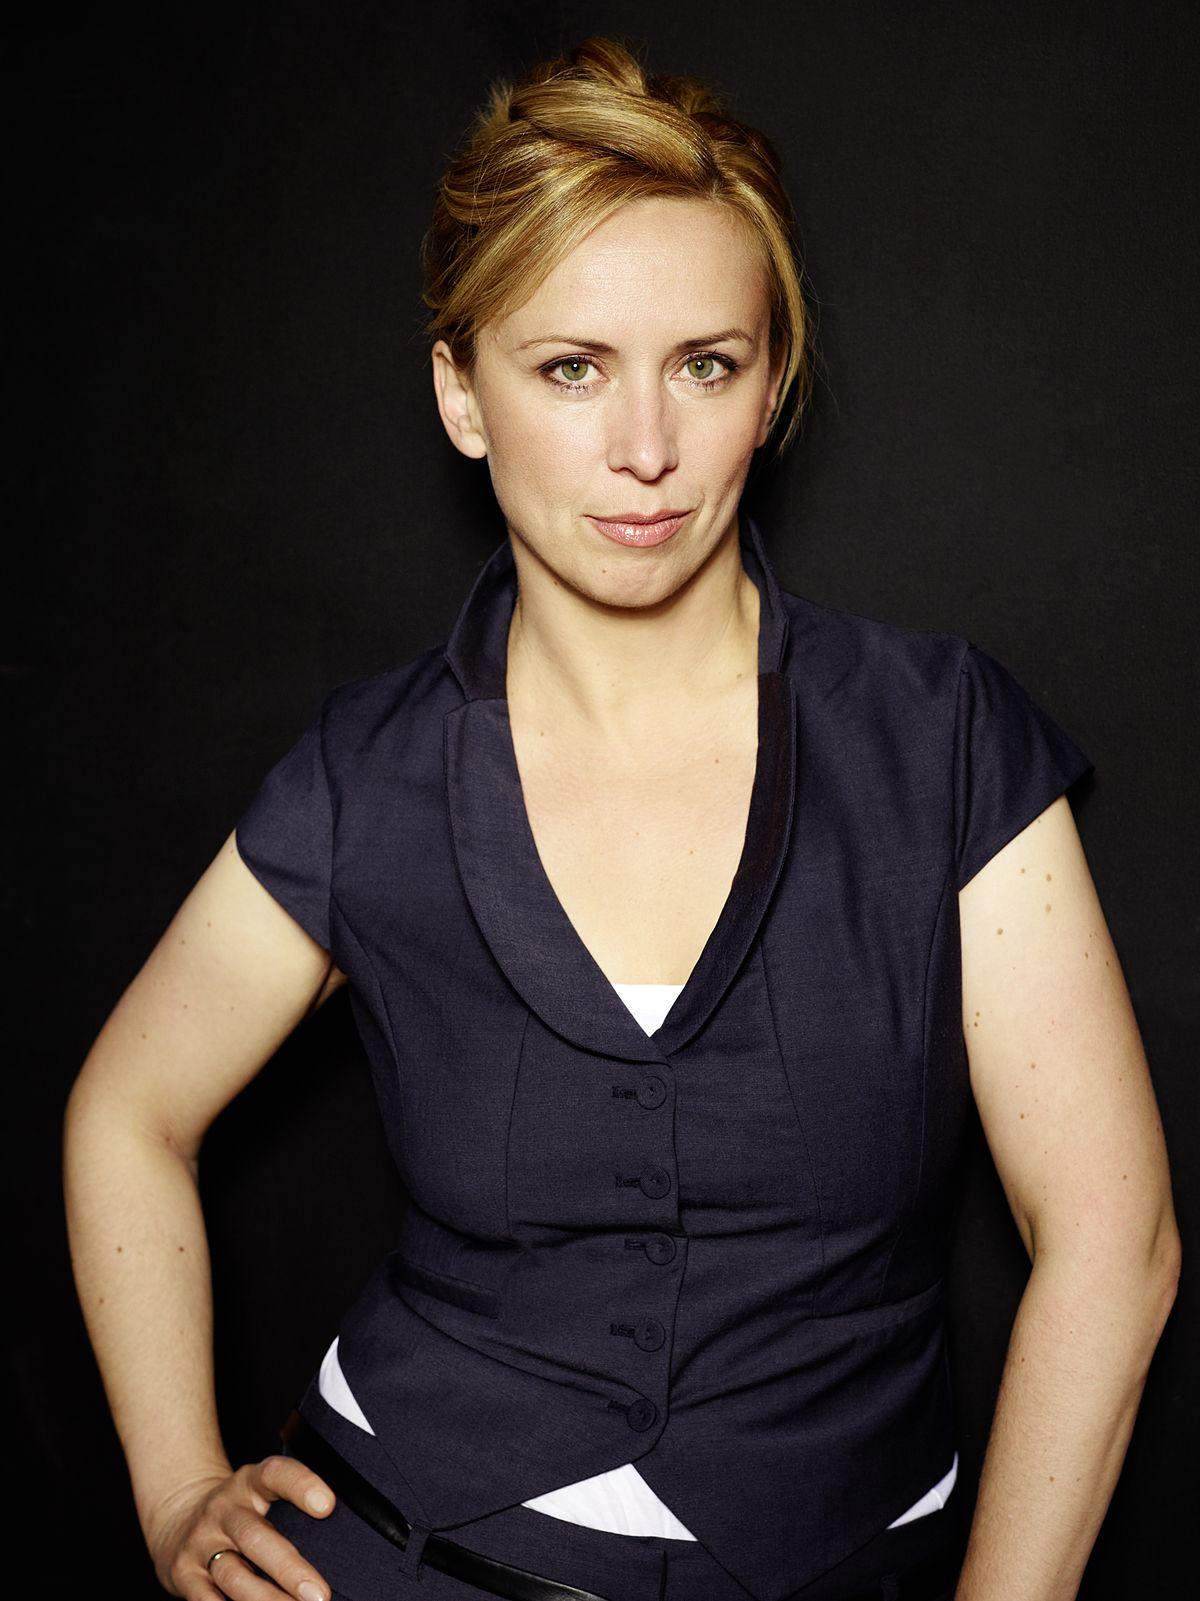 Martina Brandl – Wikipedia